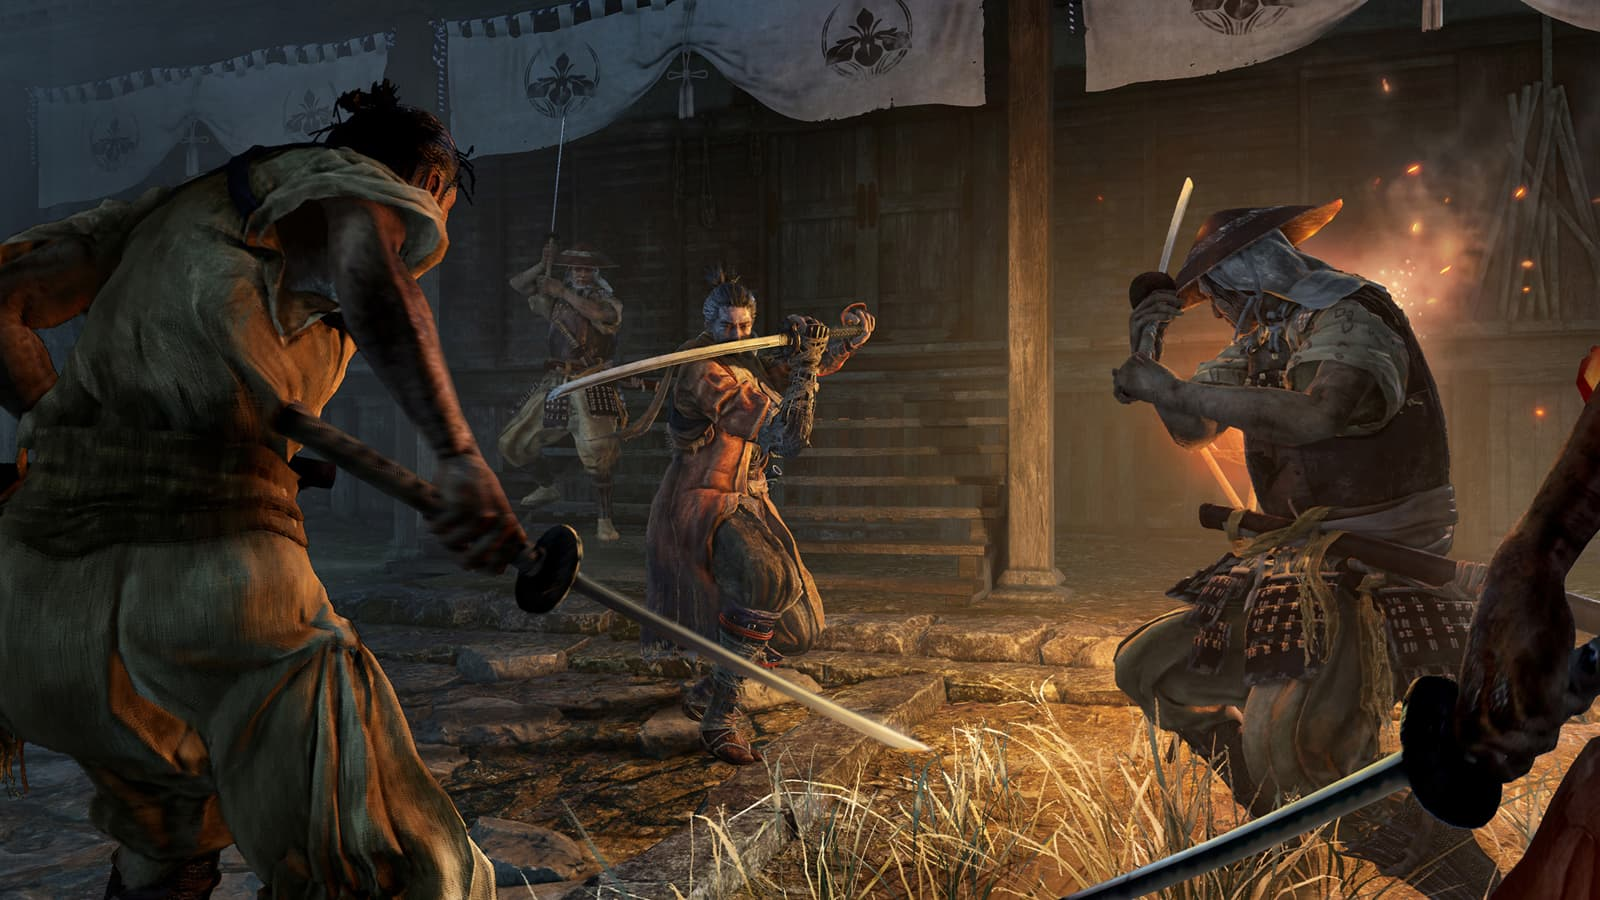 Sekiro: Shadows Die Twice Xbox E3 2018 image 3